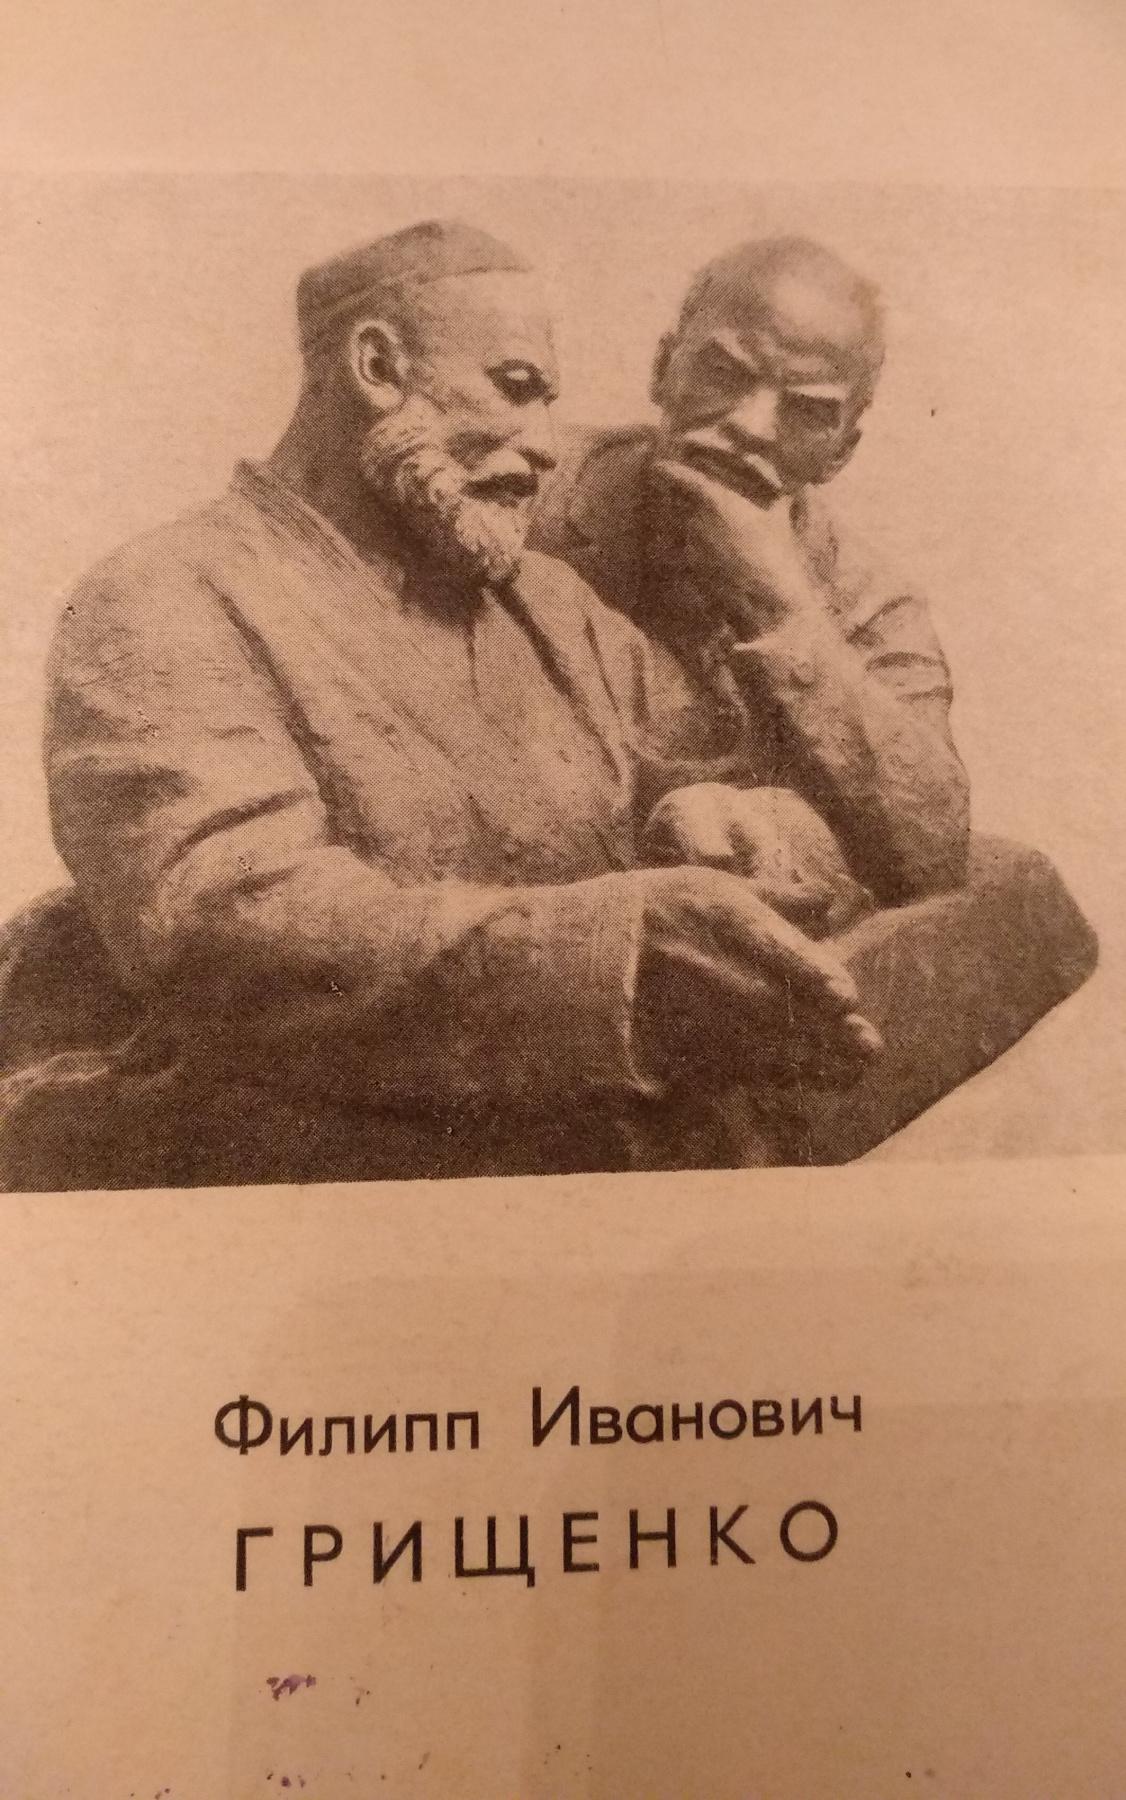 Philip Ivanovich Grischenko. V.I. Lenin with delegate of the congress S. Kasymkhojaev